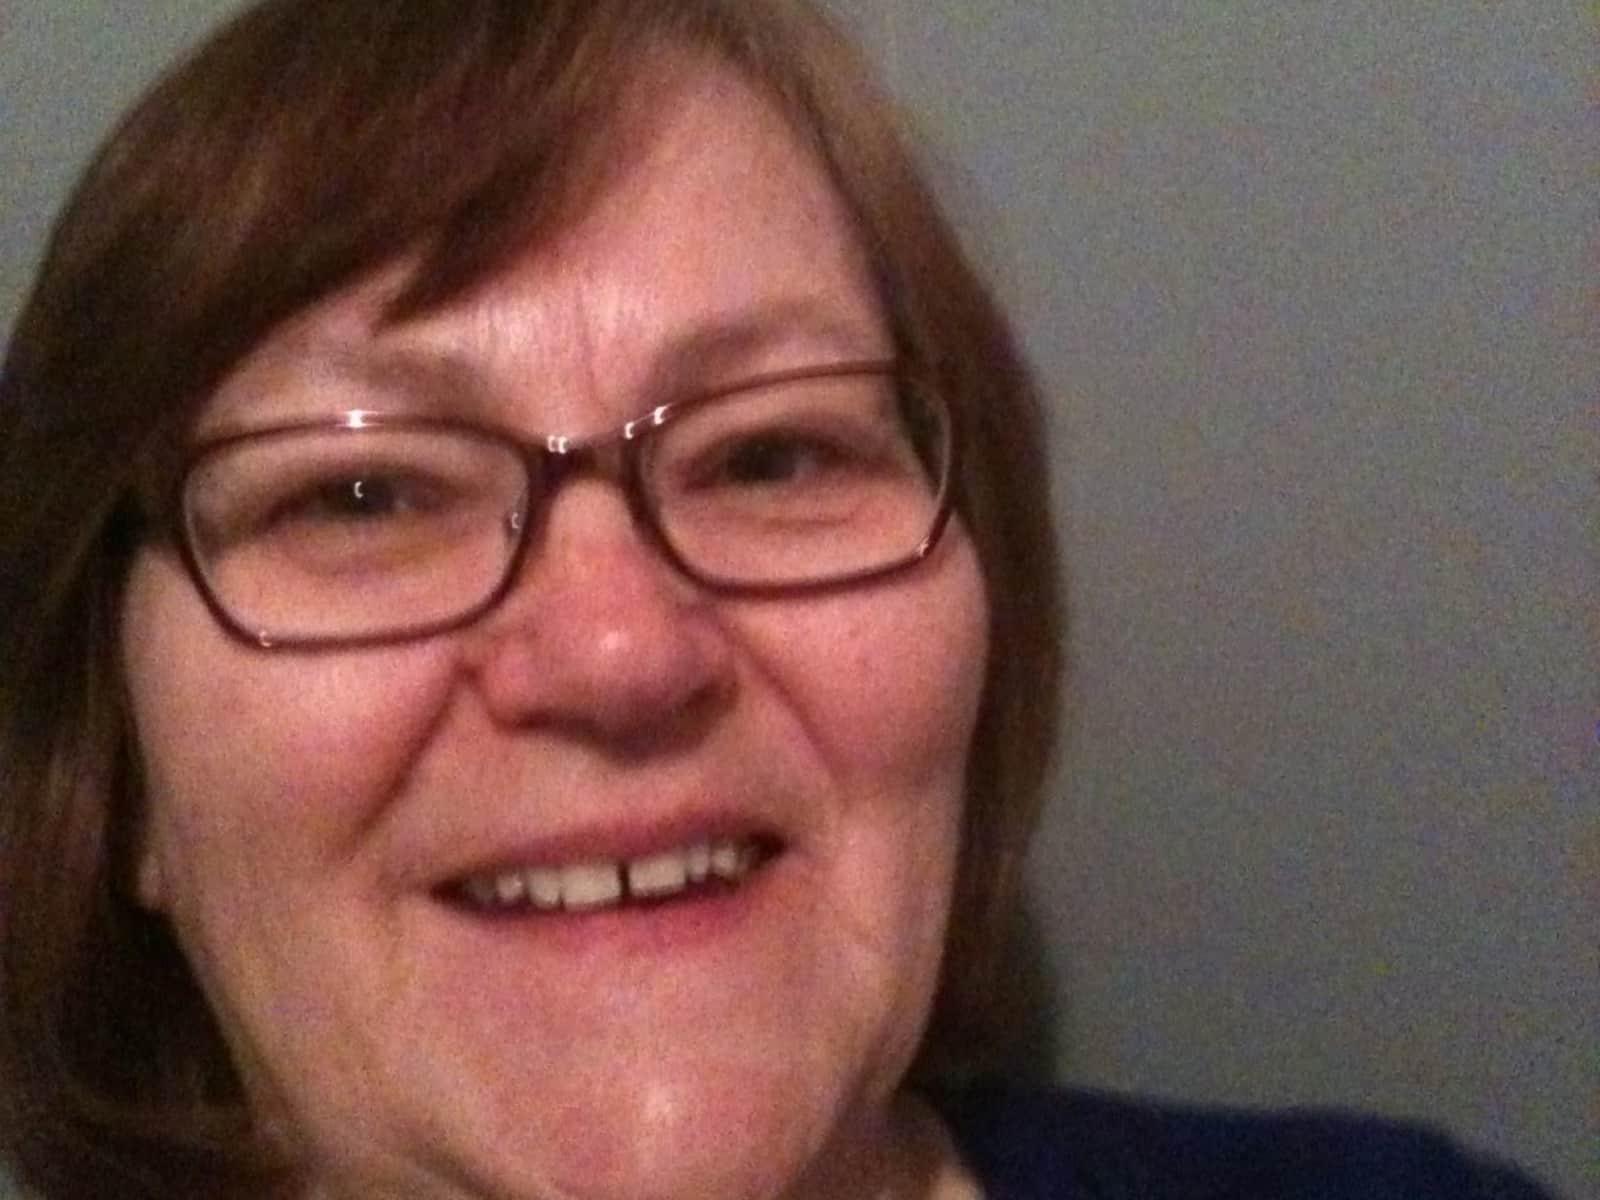 Linda from Pincher Creek, Alberta, Canada